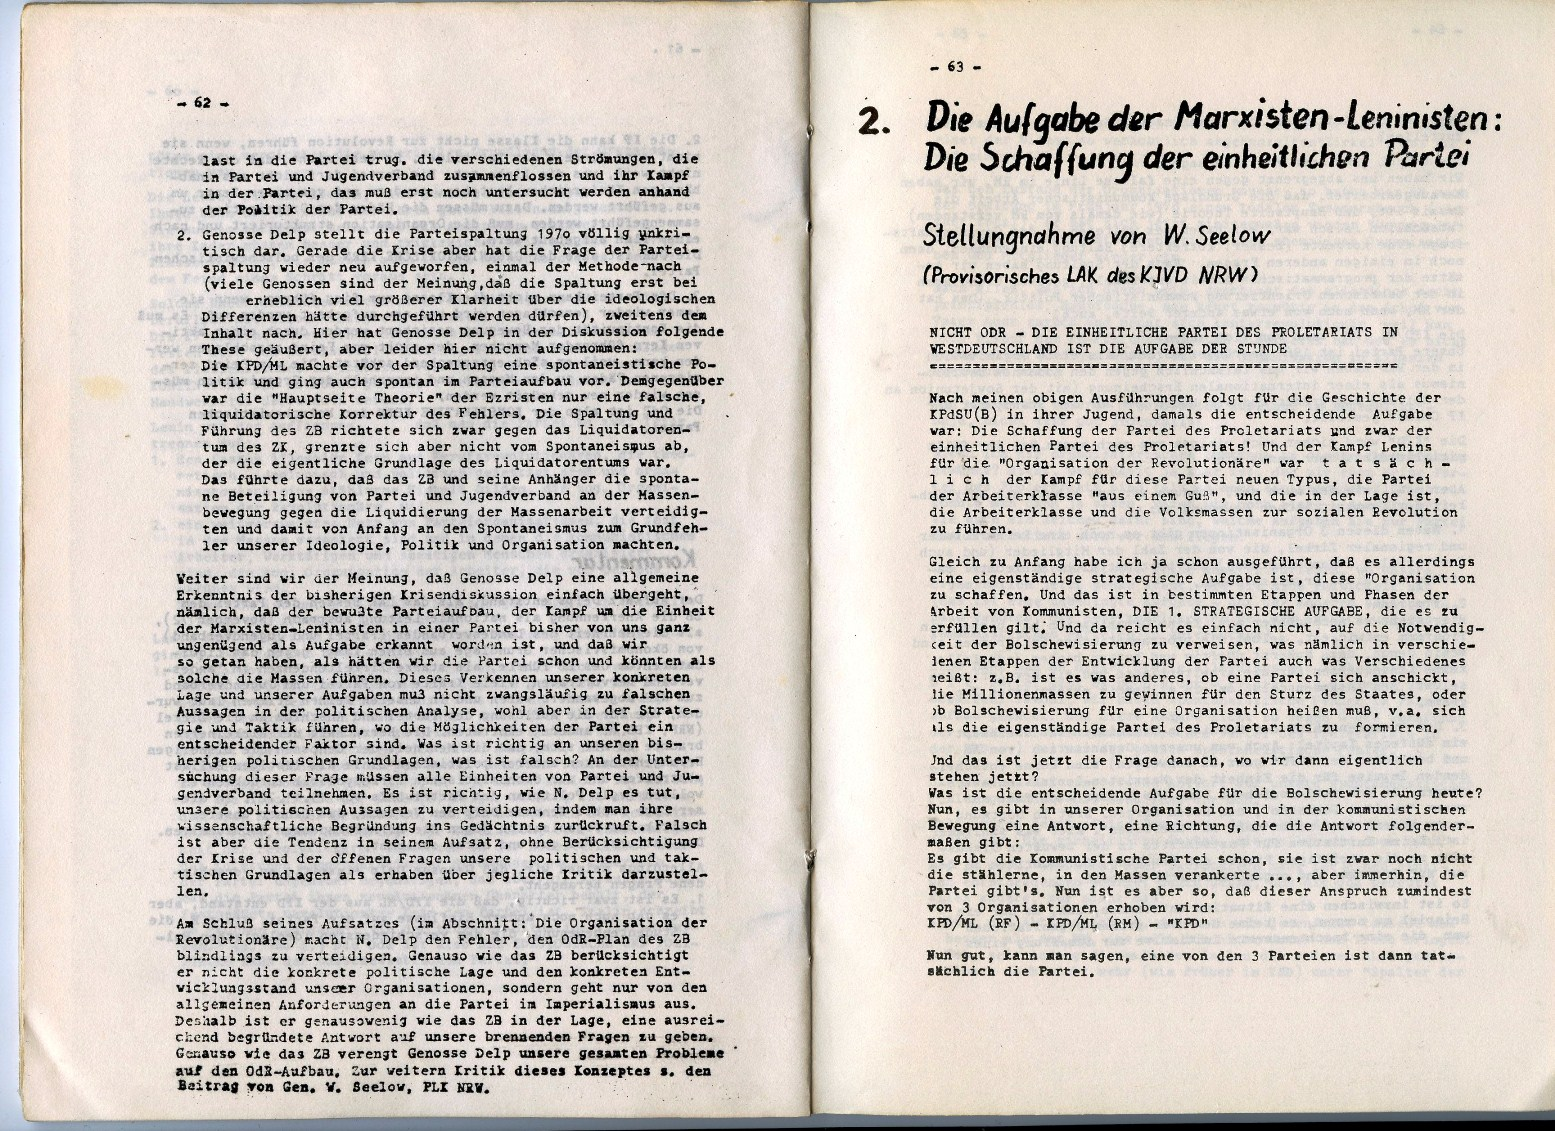 ZB_Universitas_1972_35